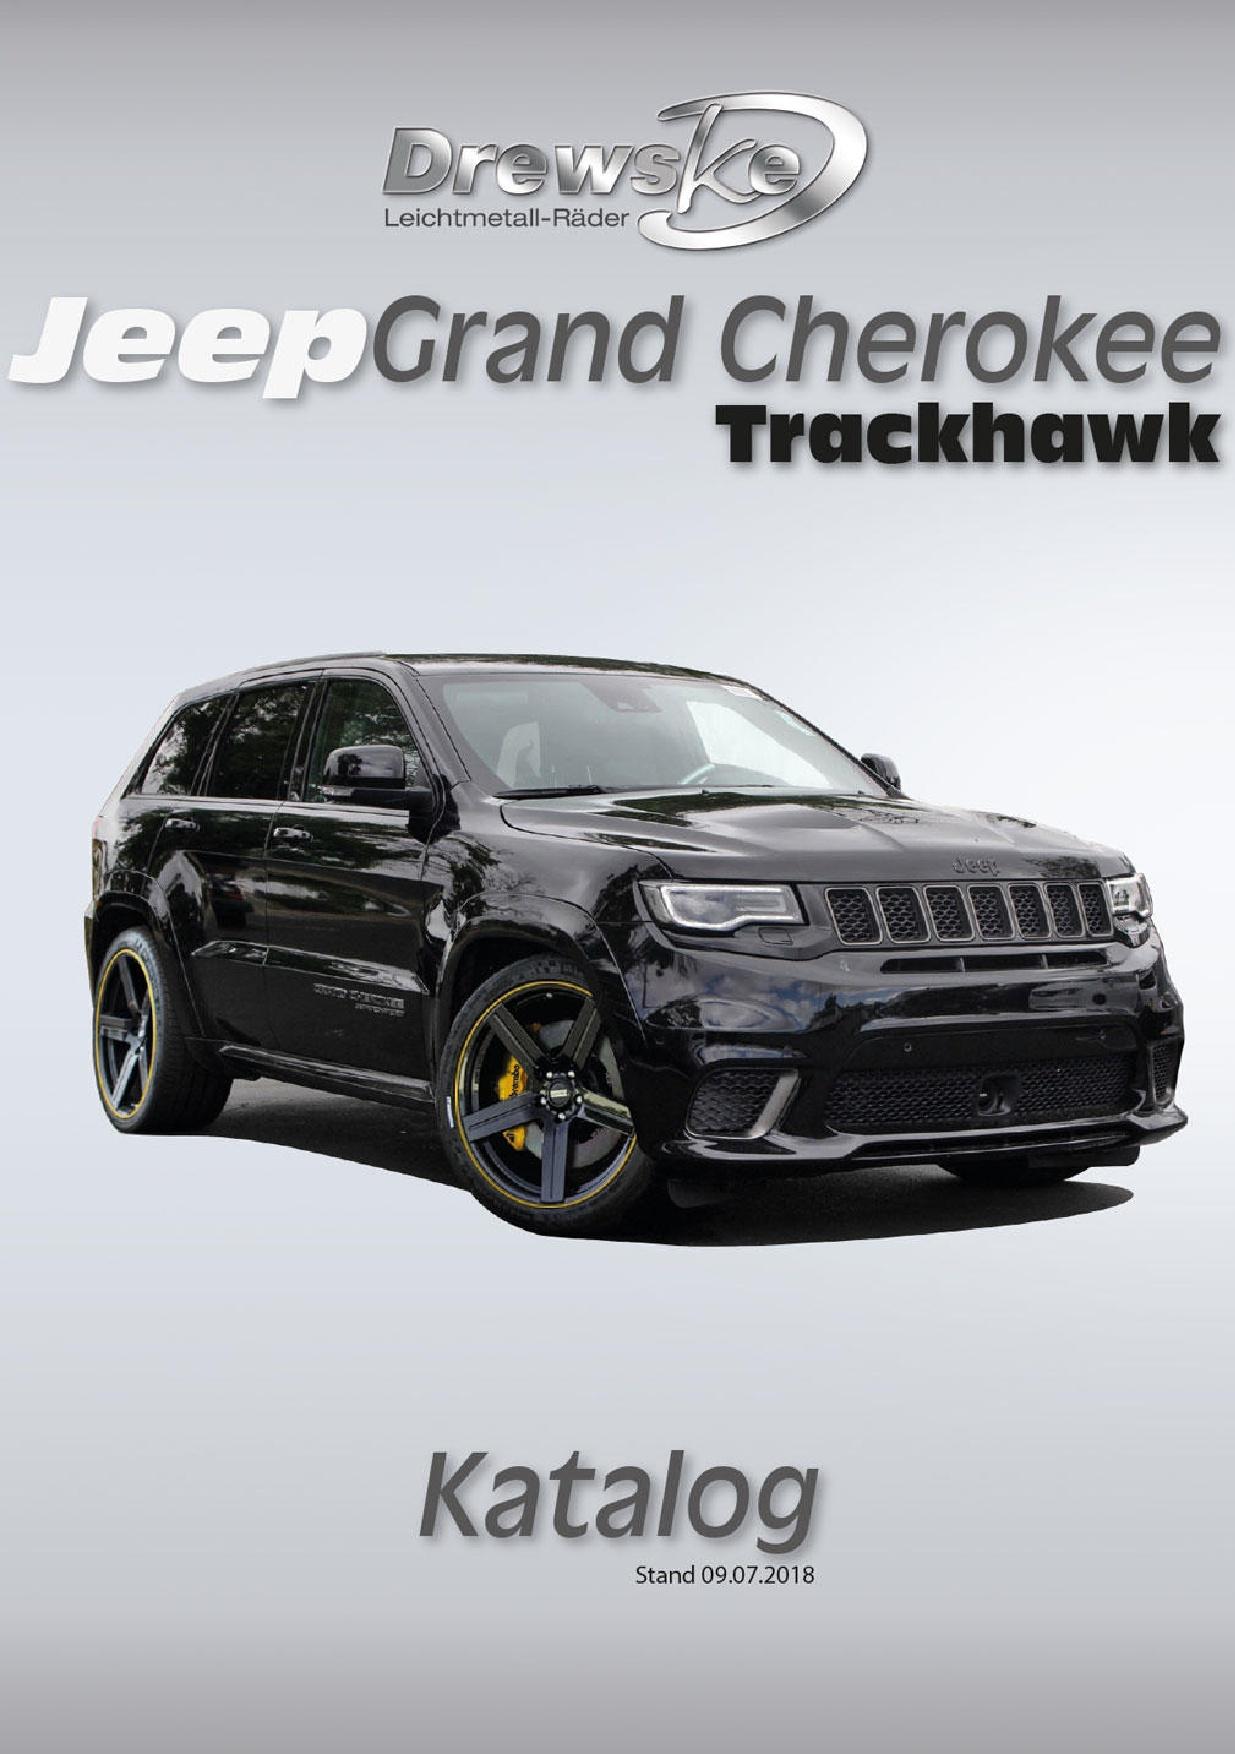 Drewske Tuning GmbH Jeep Grand Cherokee Trackhawk Katalog